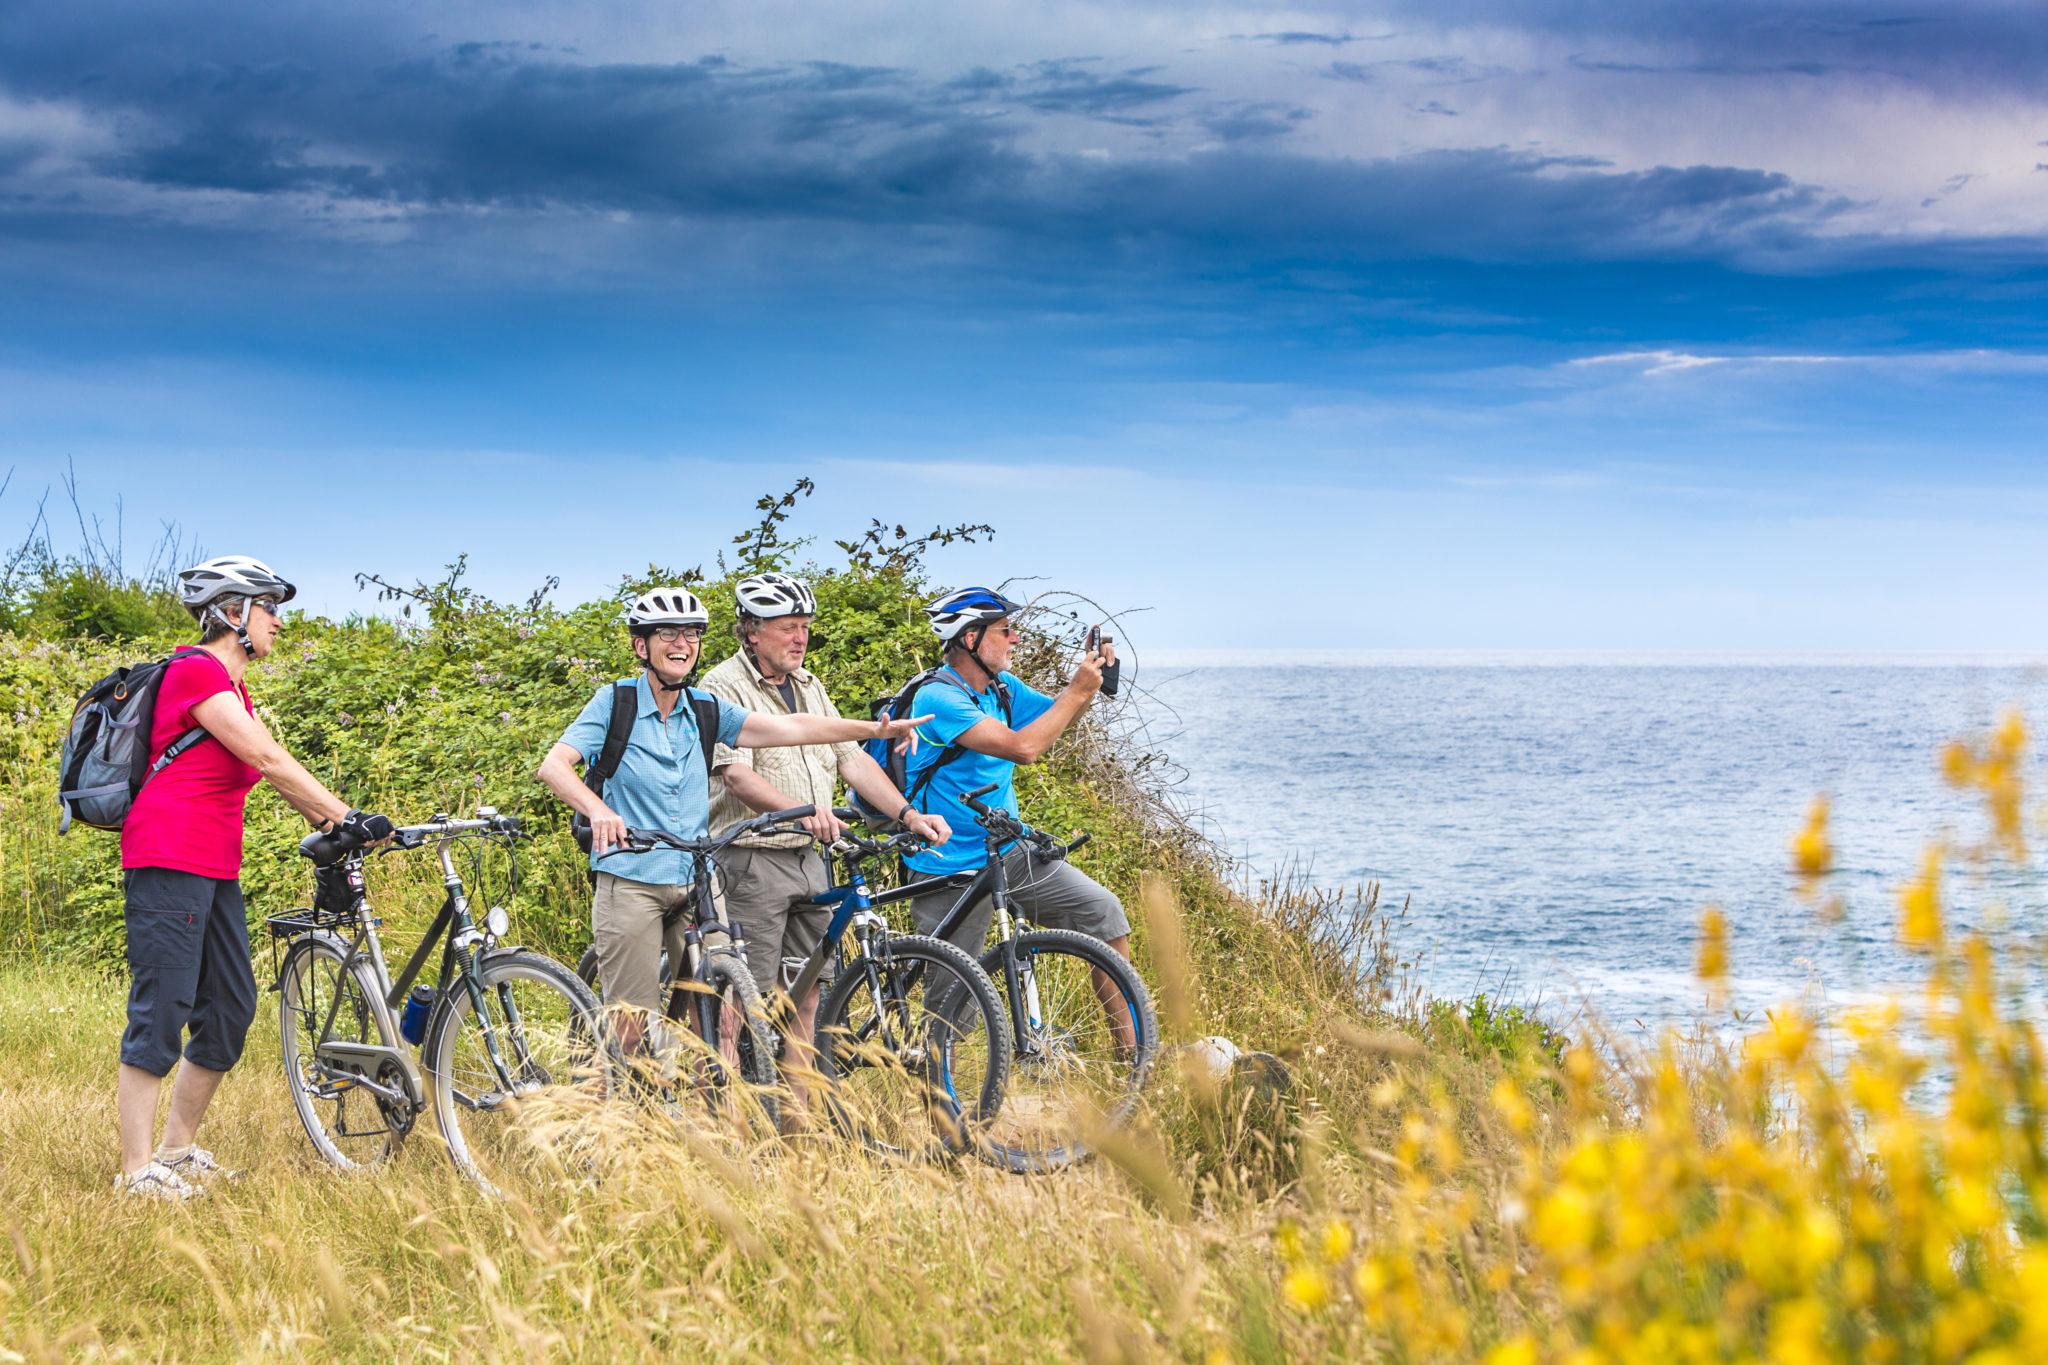 Seniors et cyclisme - vélo - découverte - Bazile Telecom